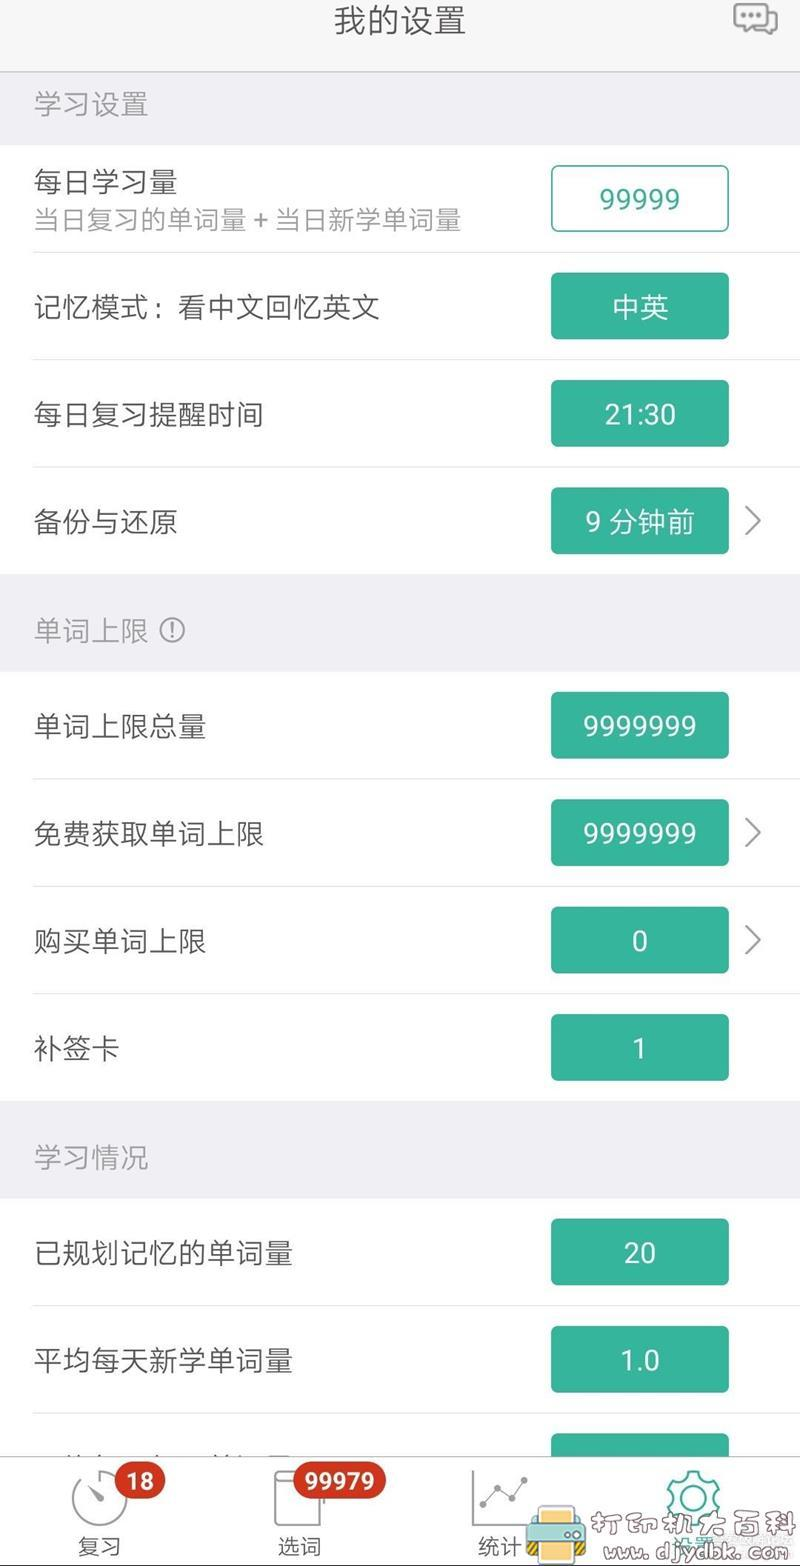 [Android]英语学习app 墨墨单词 V3.6 无上限可用版 配图 No.1